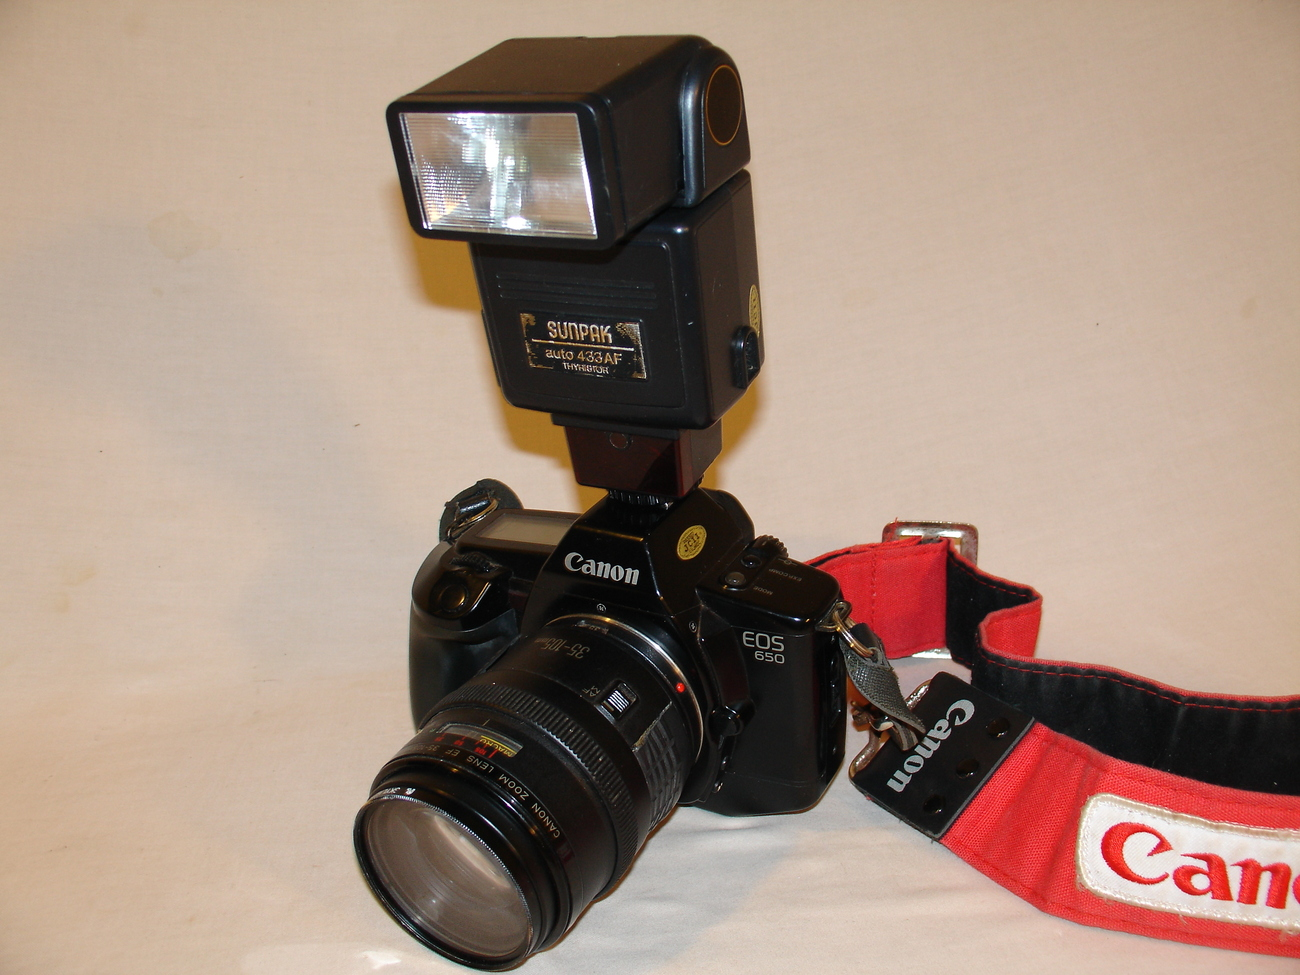 Canon EOS 650 SLR 35mm Film Camera with Sunpack Flash